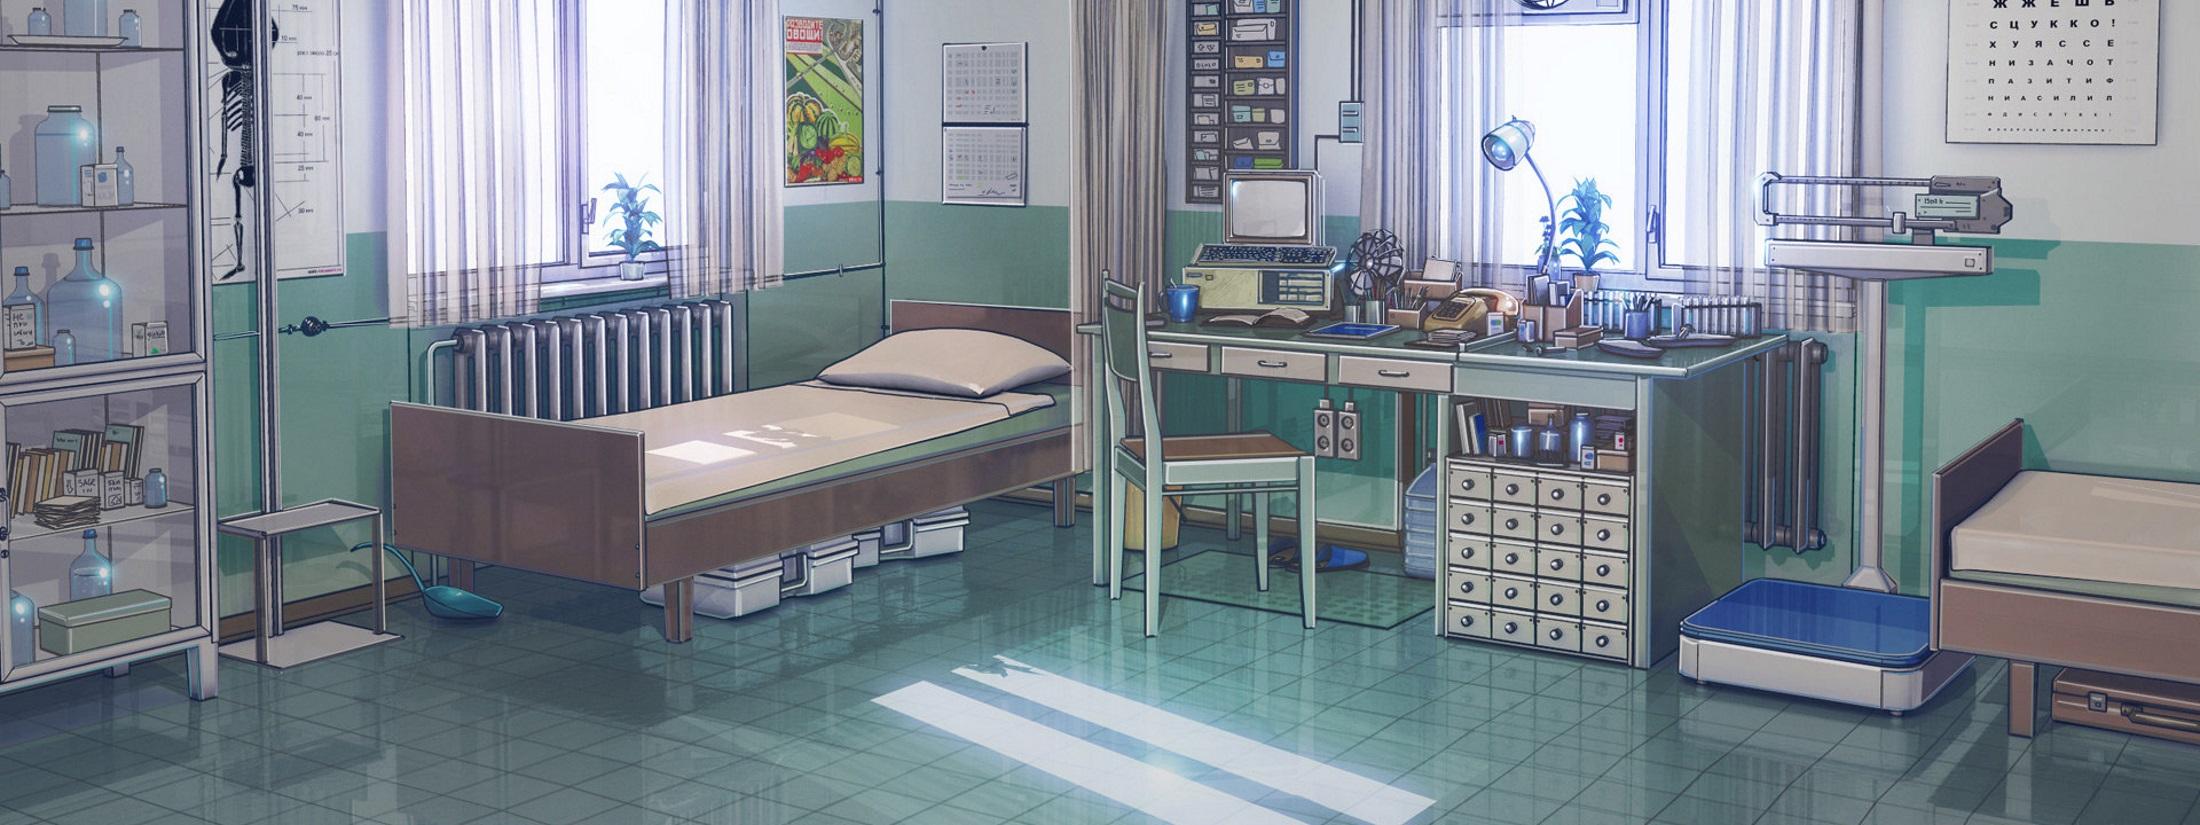 XL Background - Hospital 02.jpg